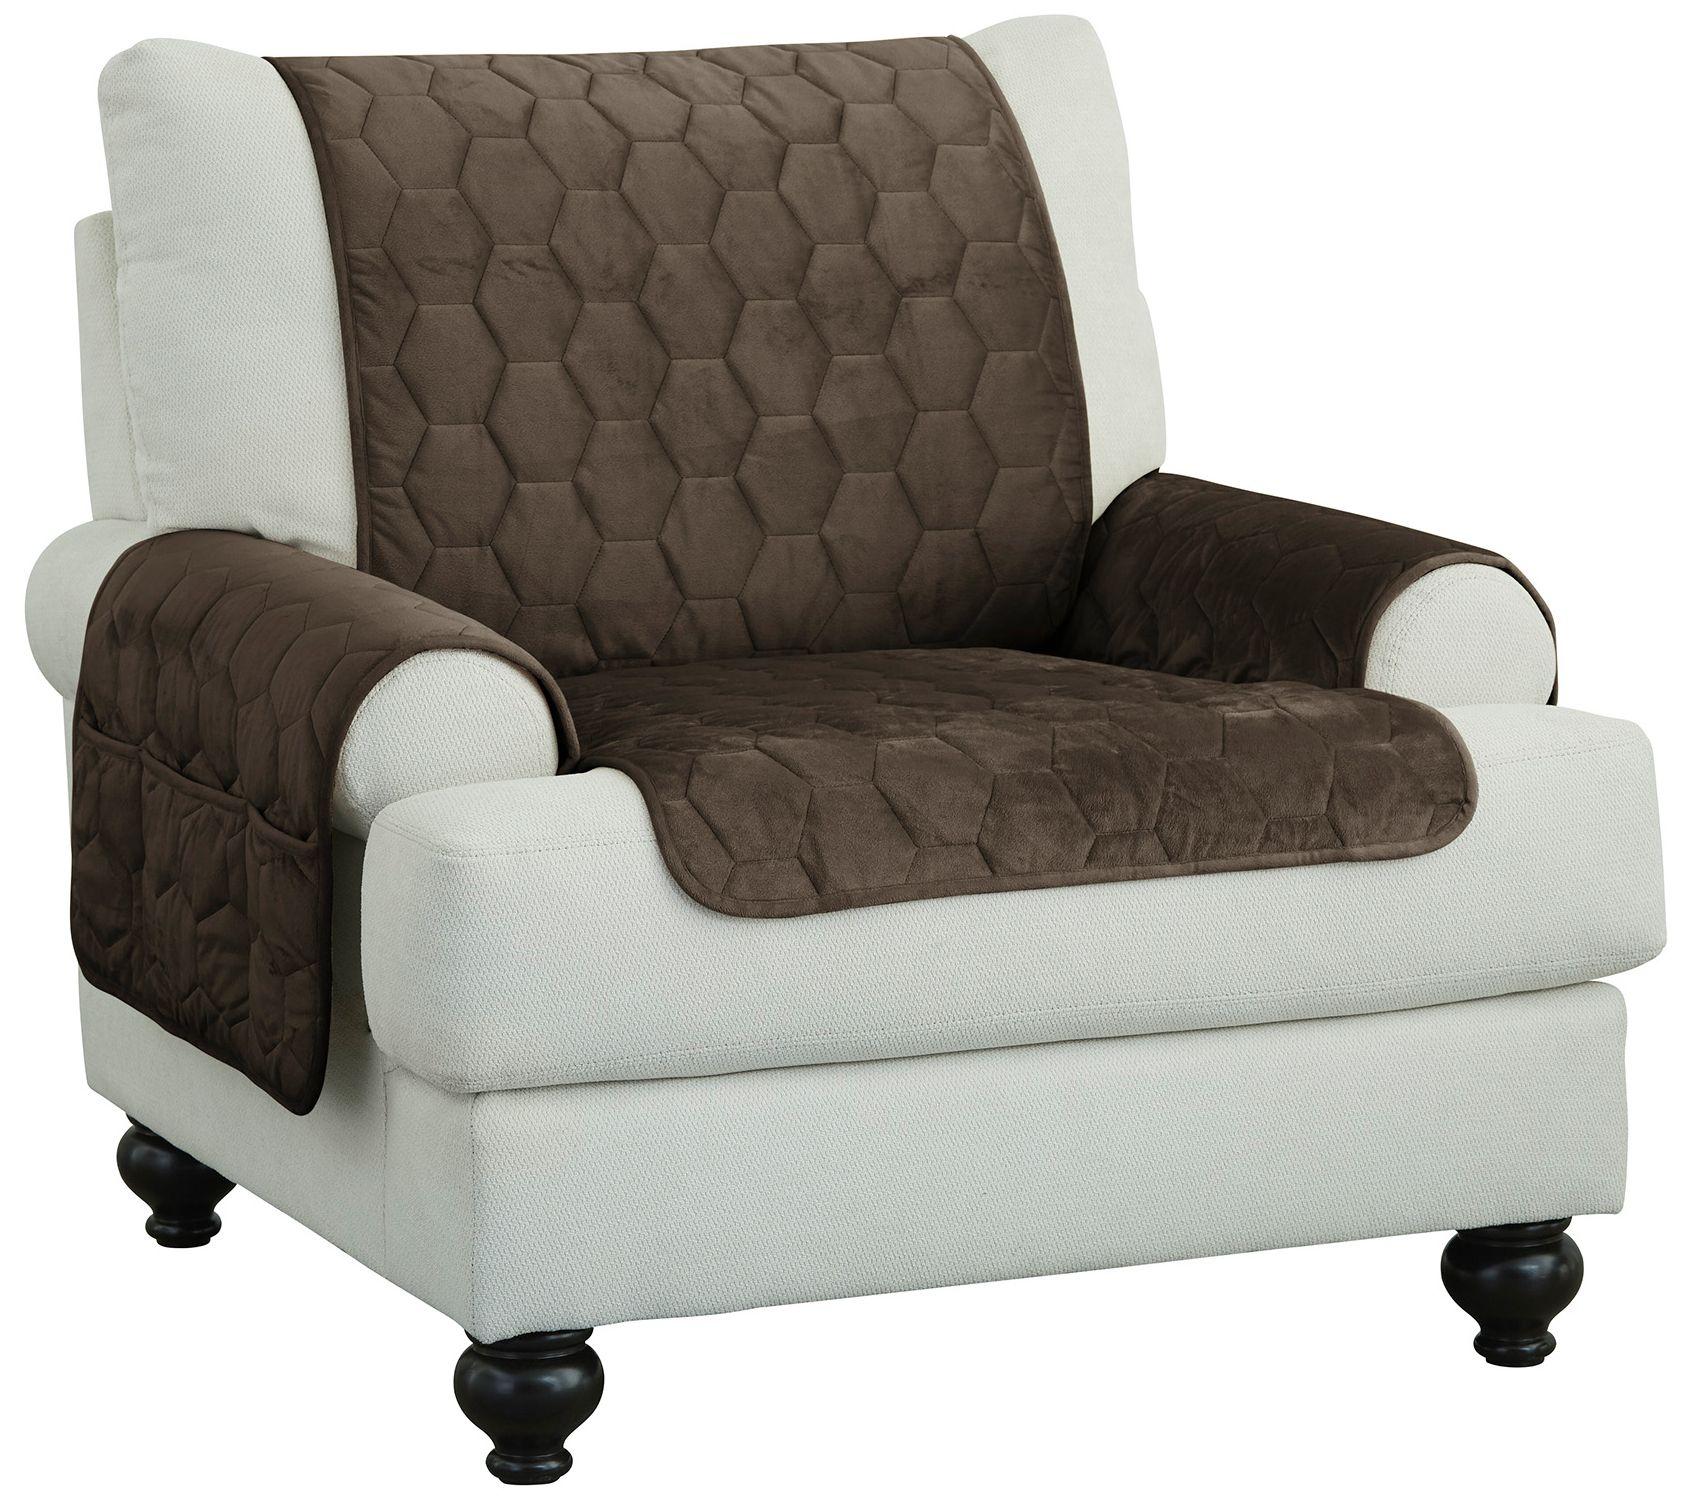 Get 18% off waterproof furniture cover